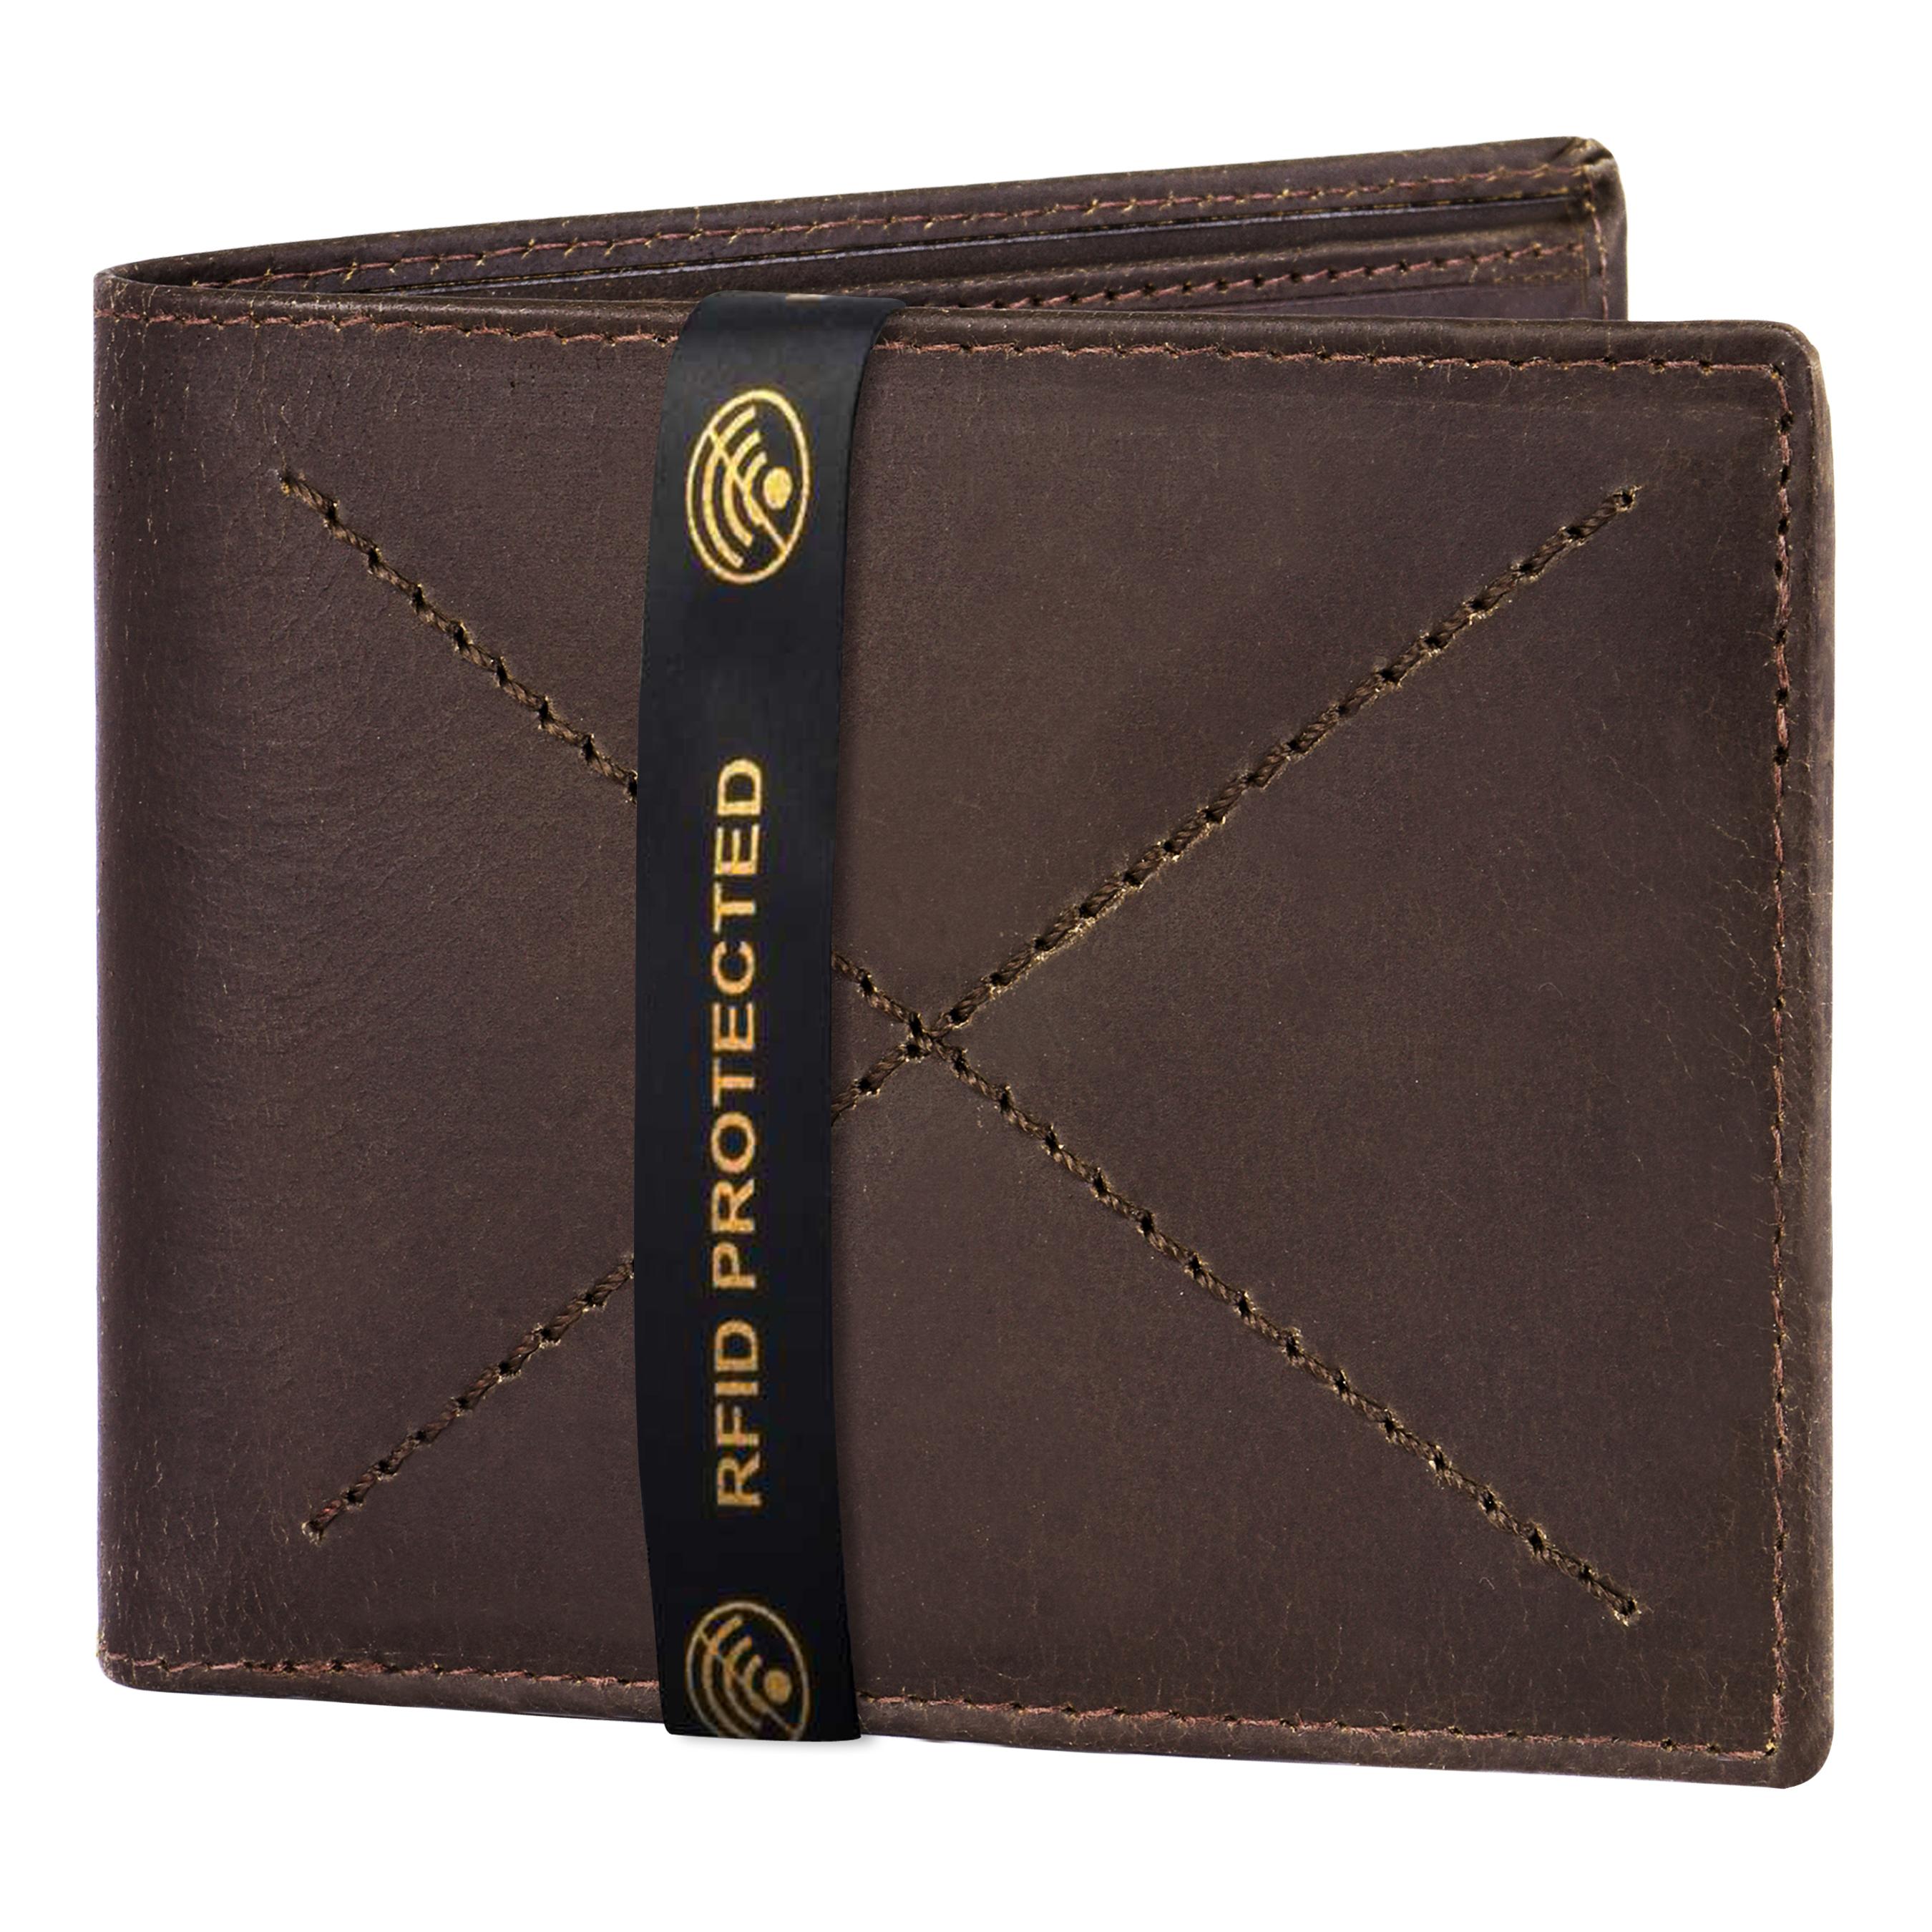 Walrus | Walrus Elite II Brown Premium Genuine Leather Men Wallet With RFID Protection.